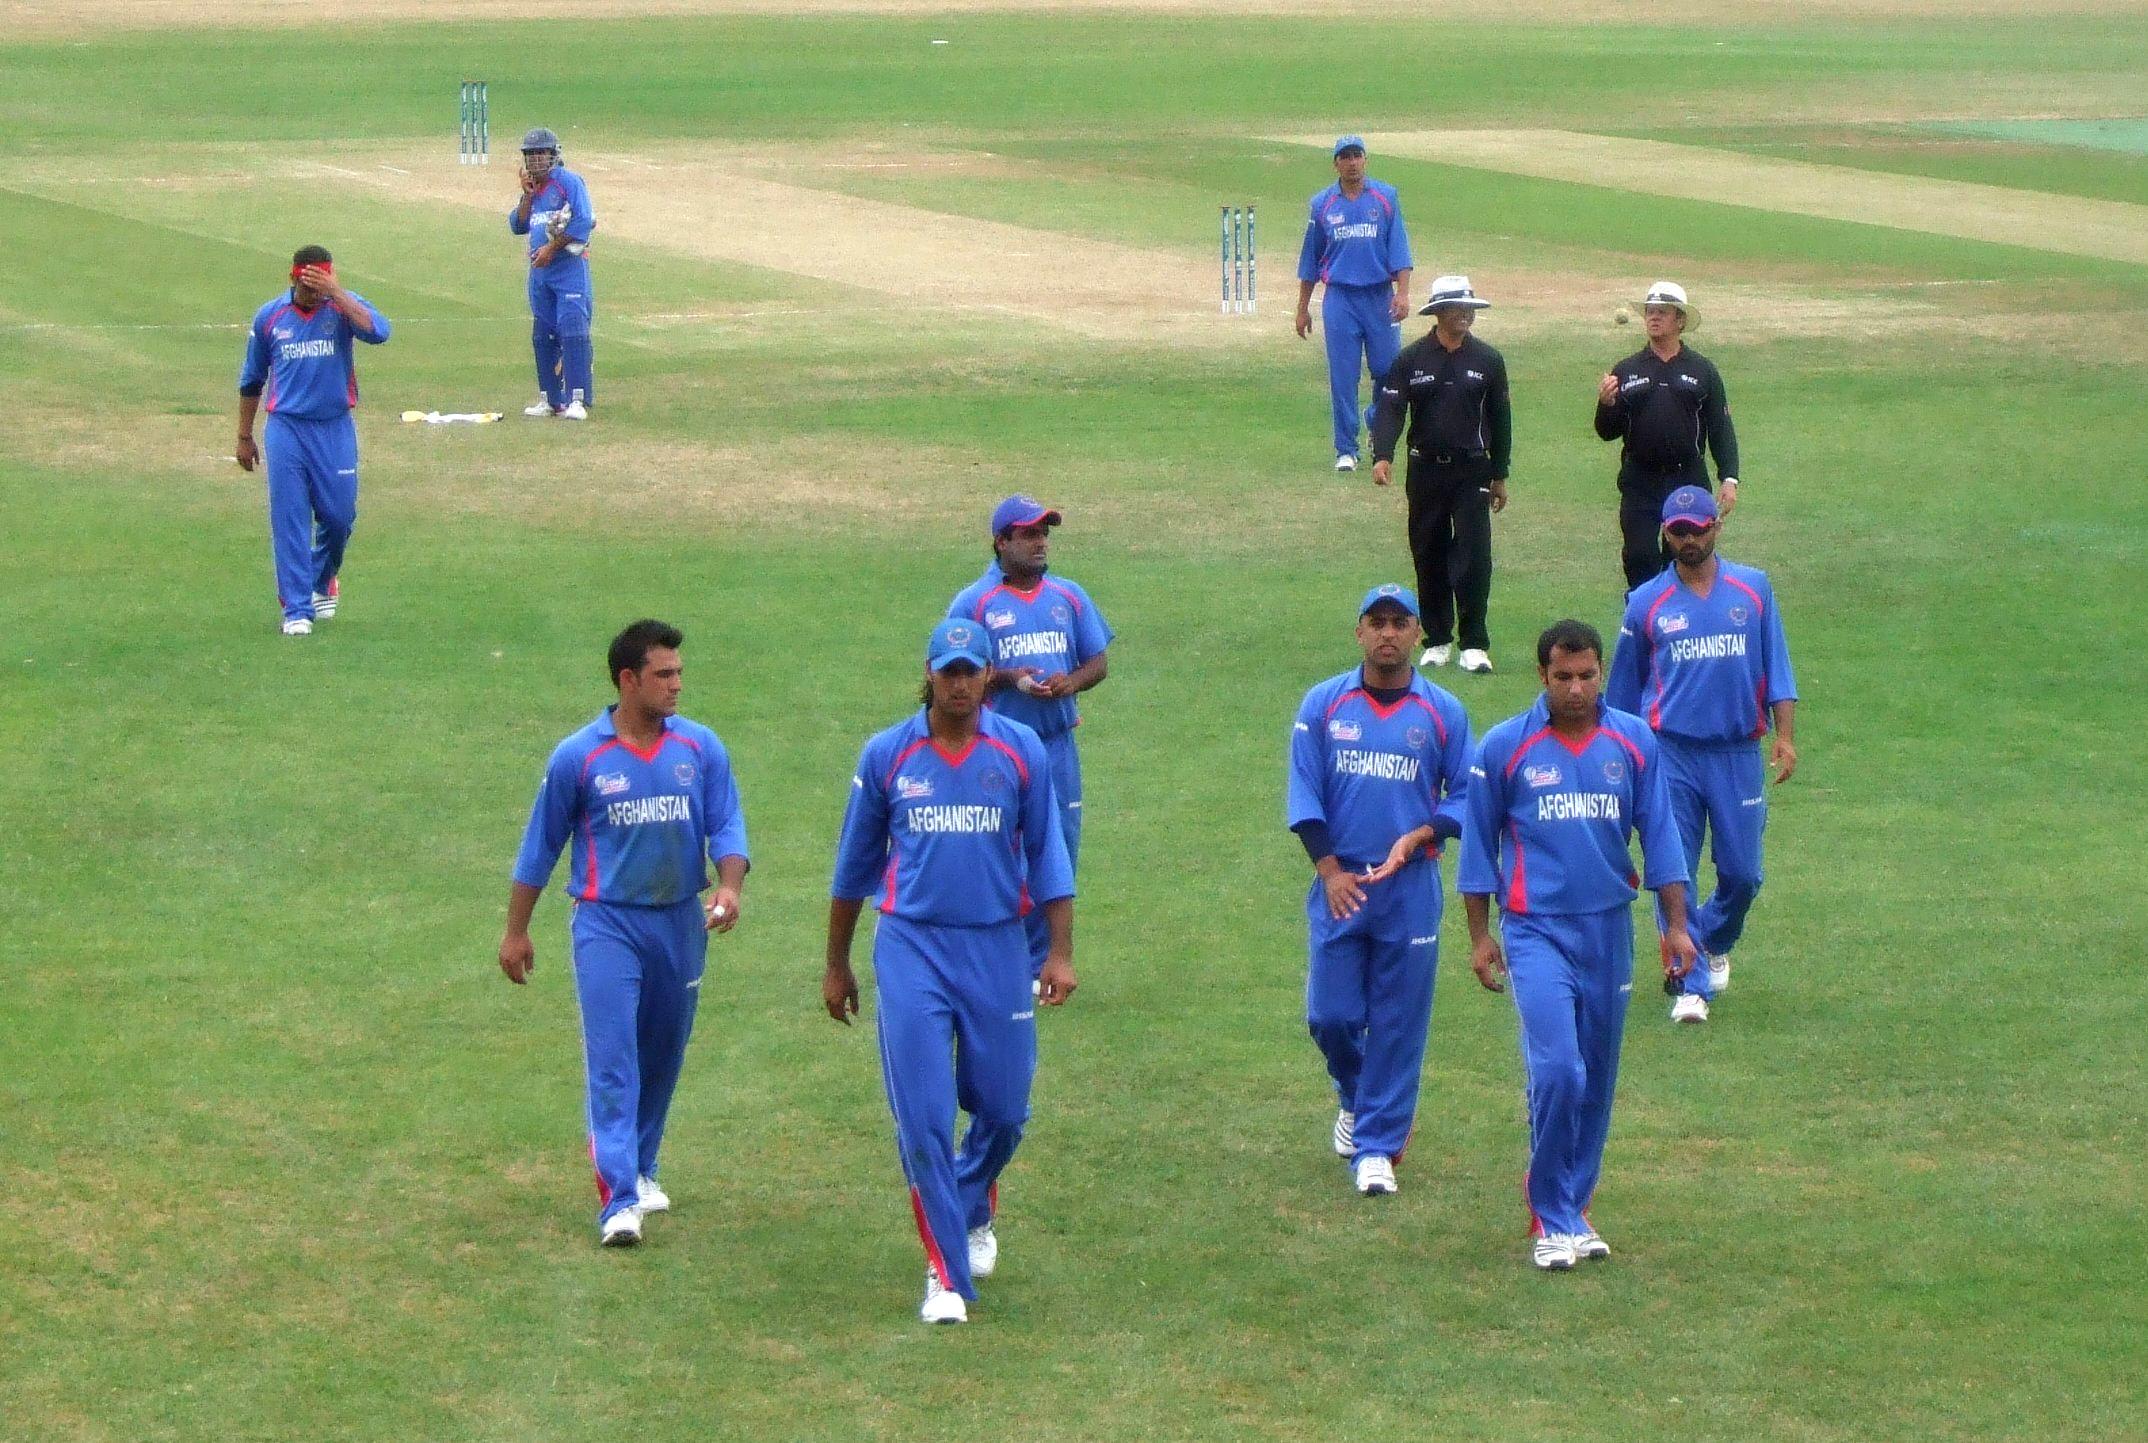 Pakistan vs Afghanistan ODI series moves to Pakistan, ACB confirms